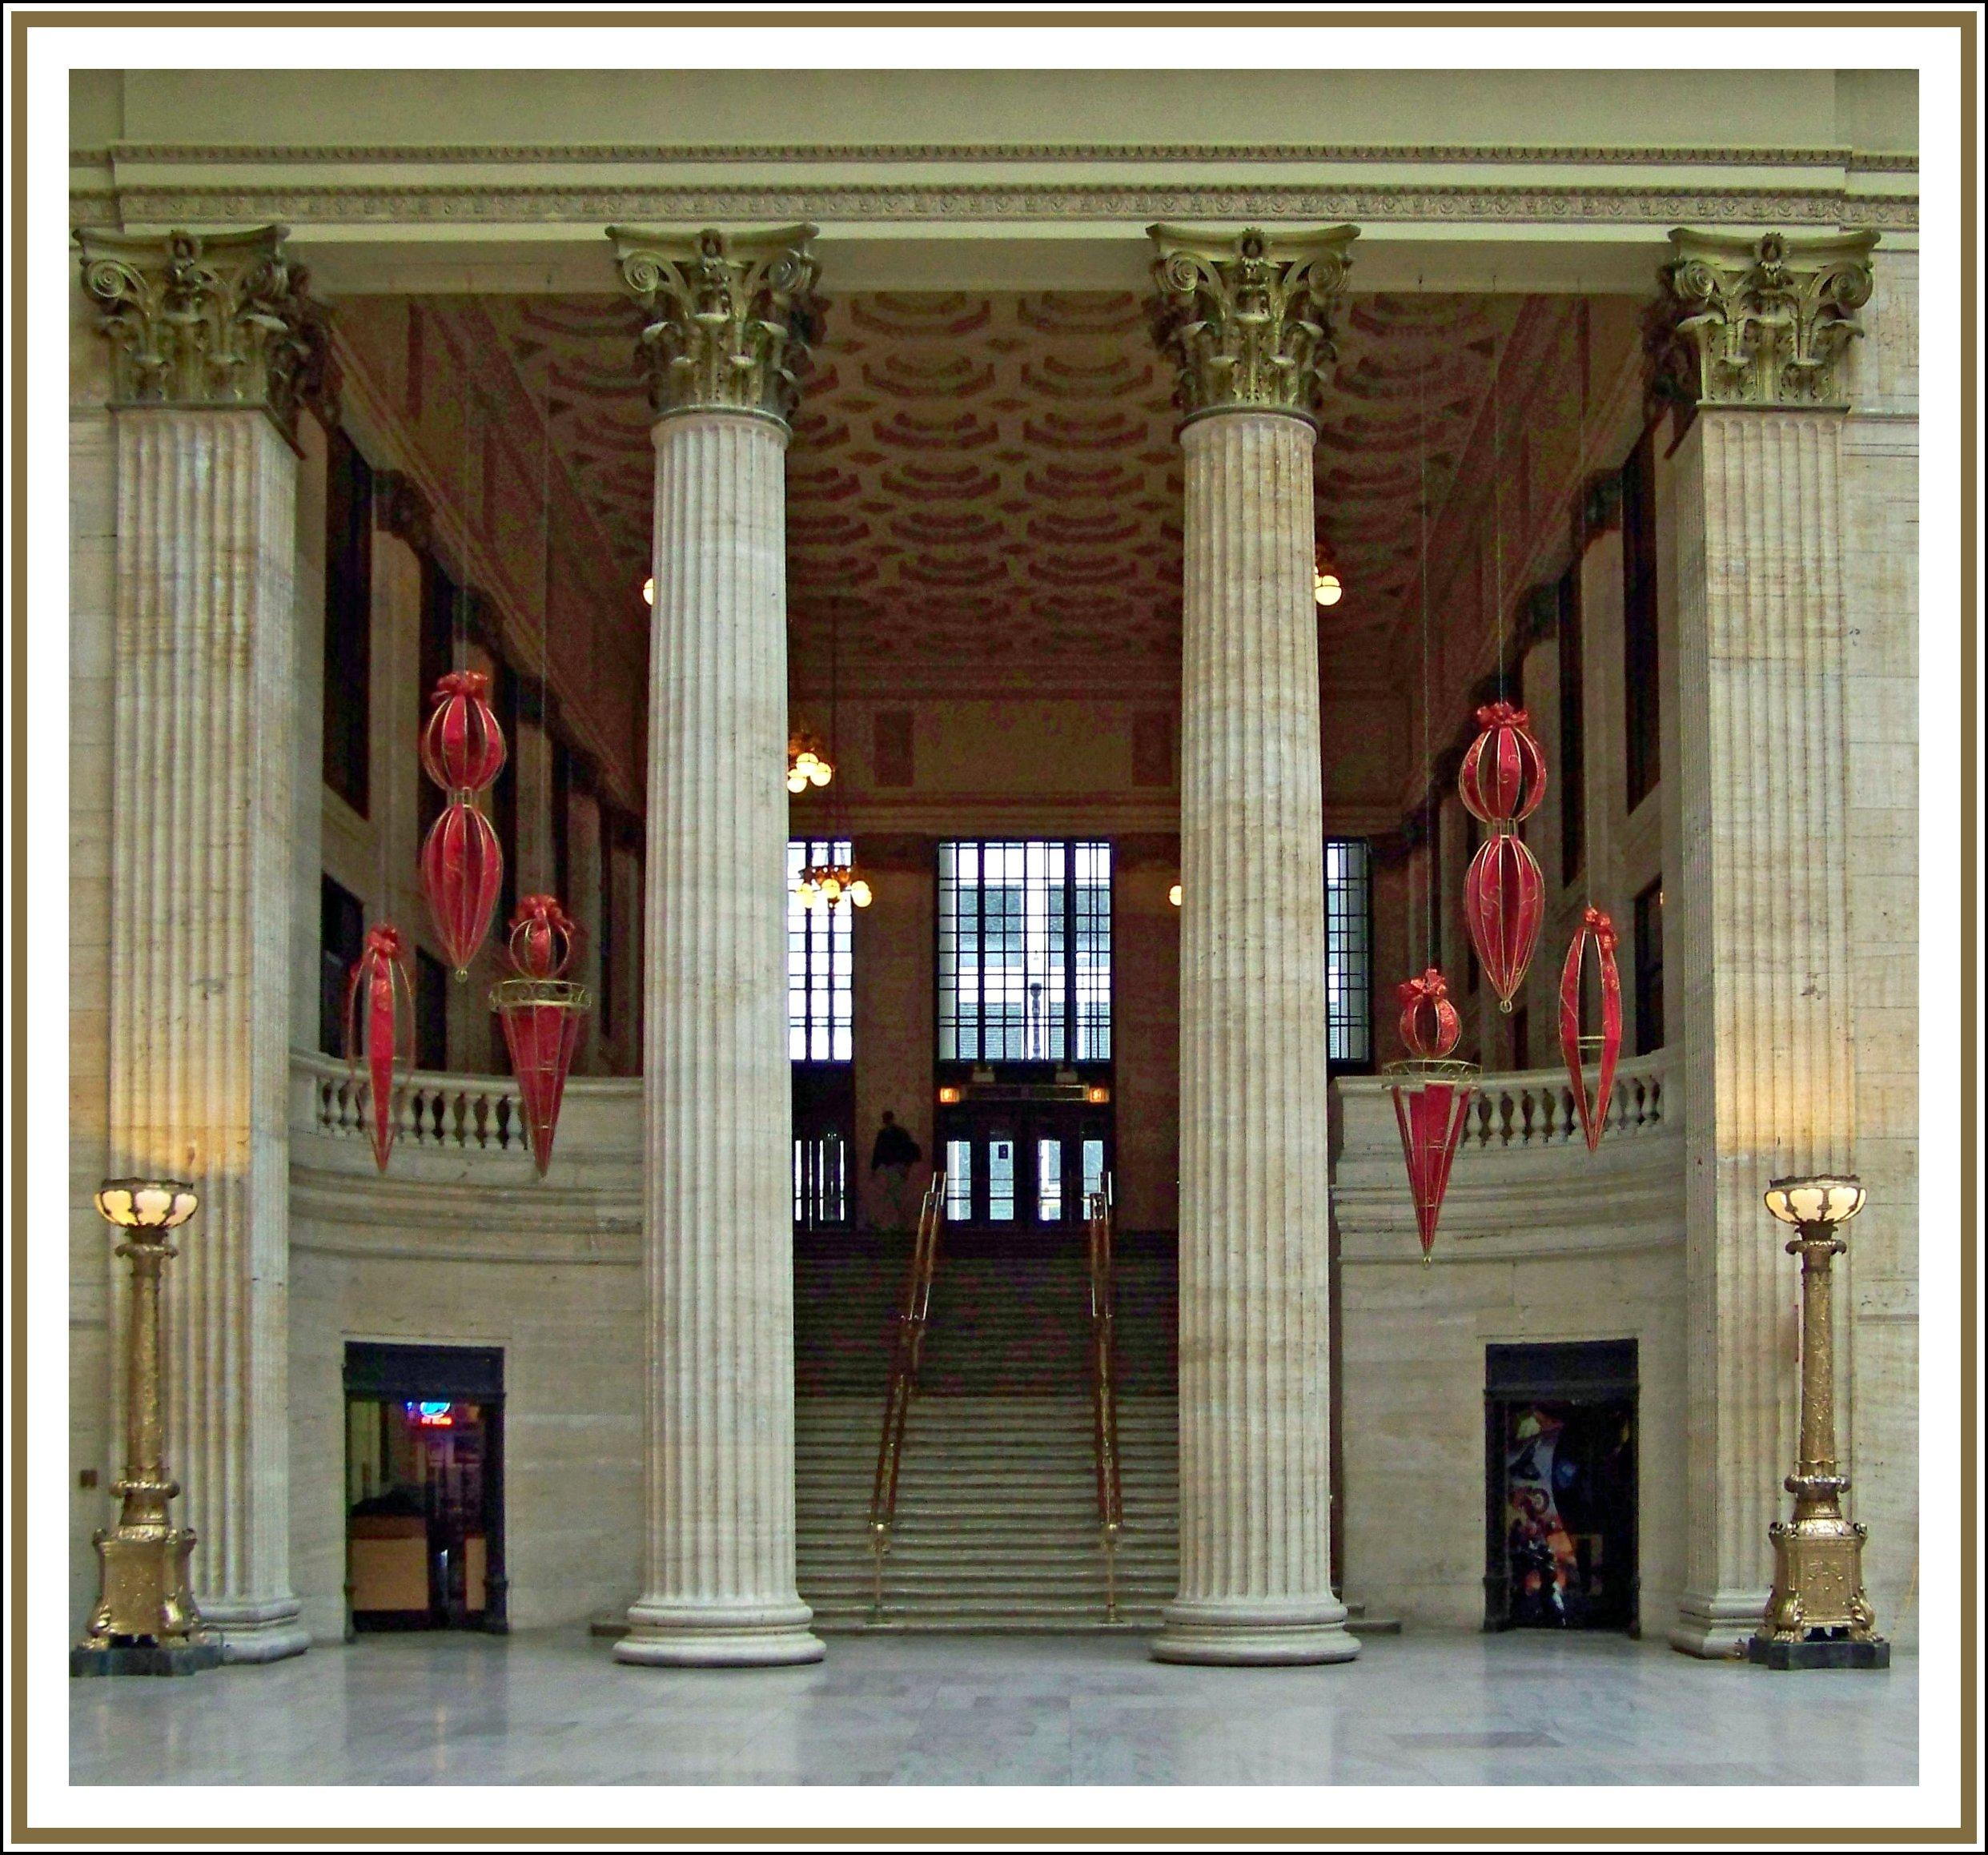 filechristmas chicago union station panoramiojpg - Chicago Christmas Station